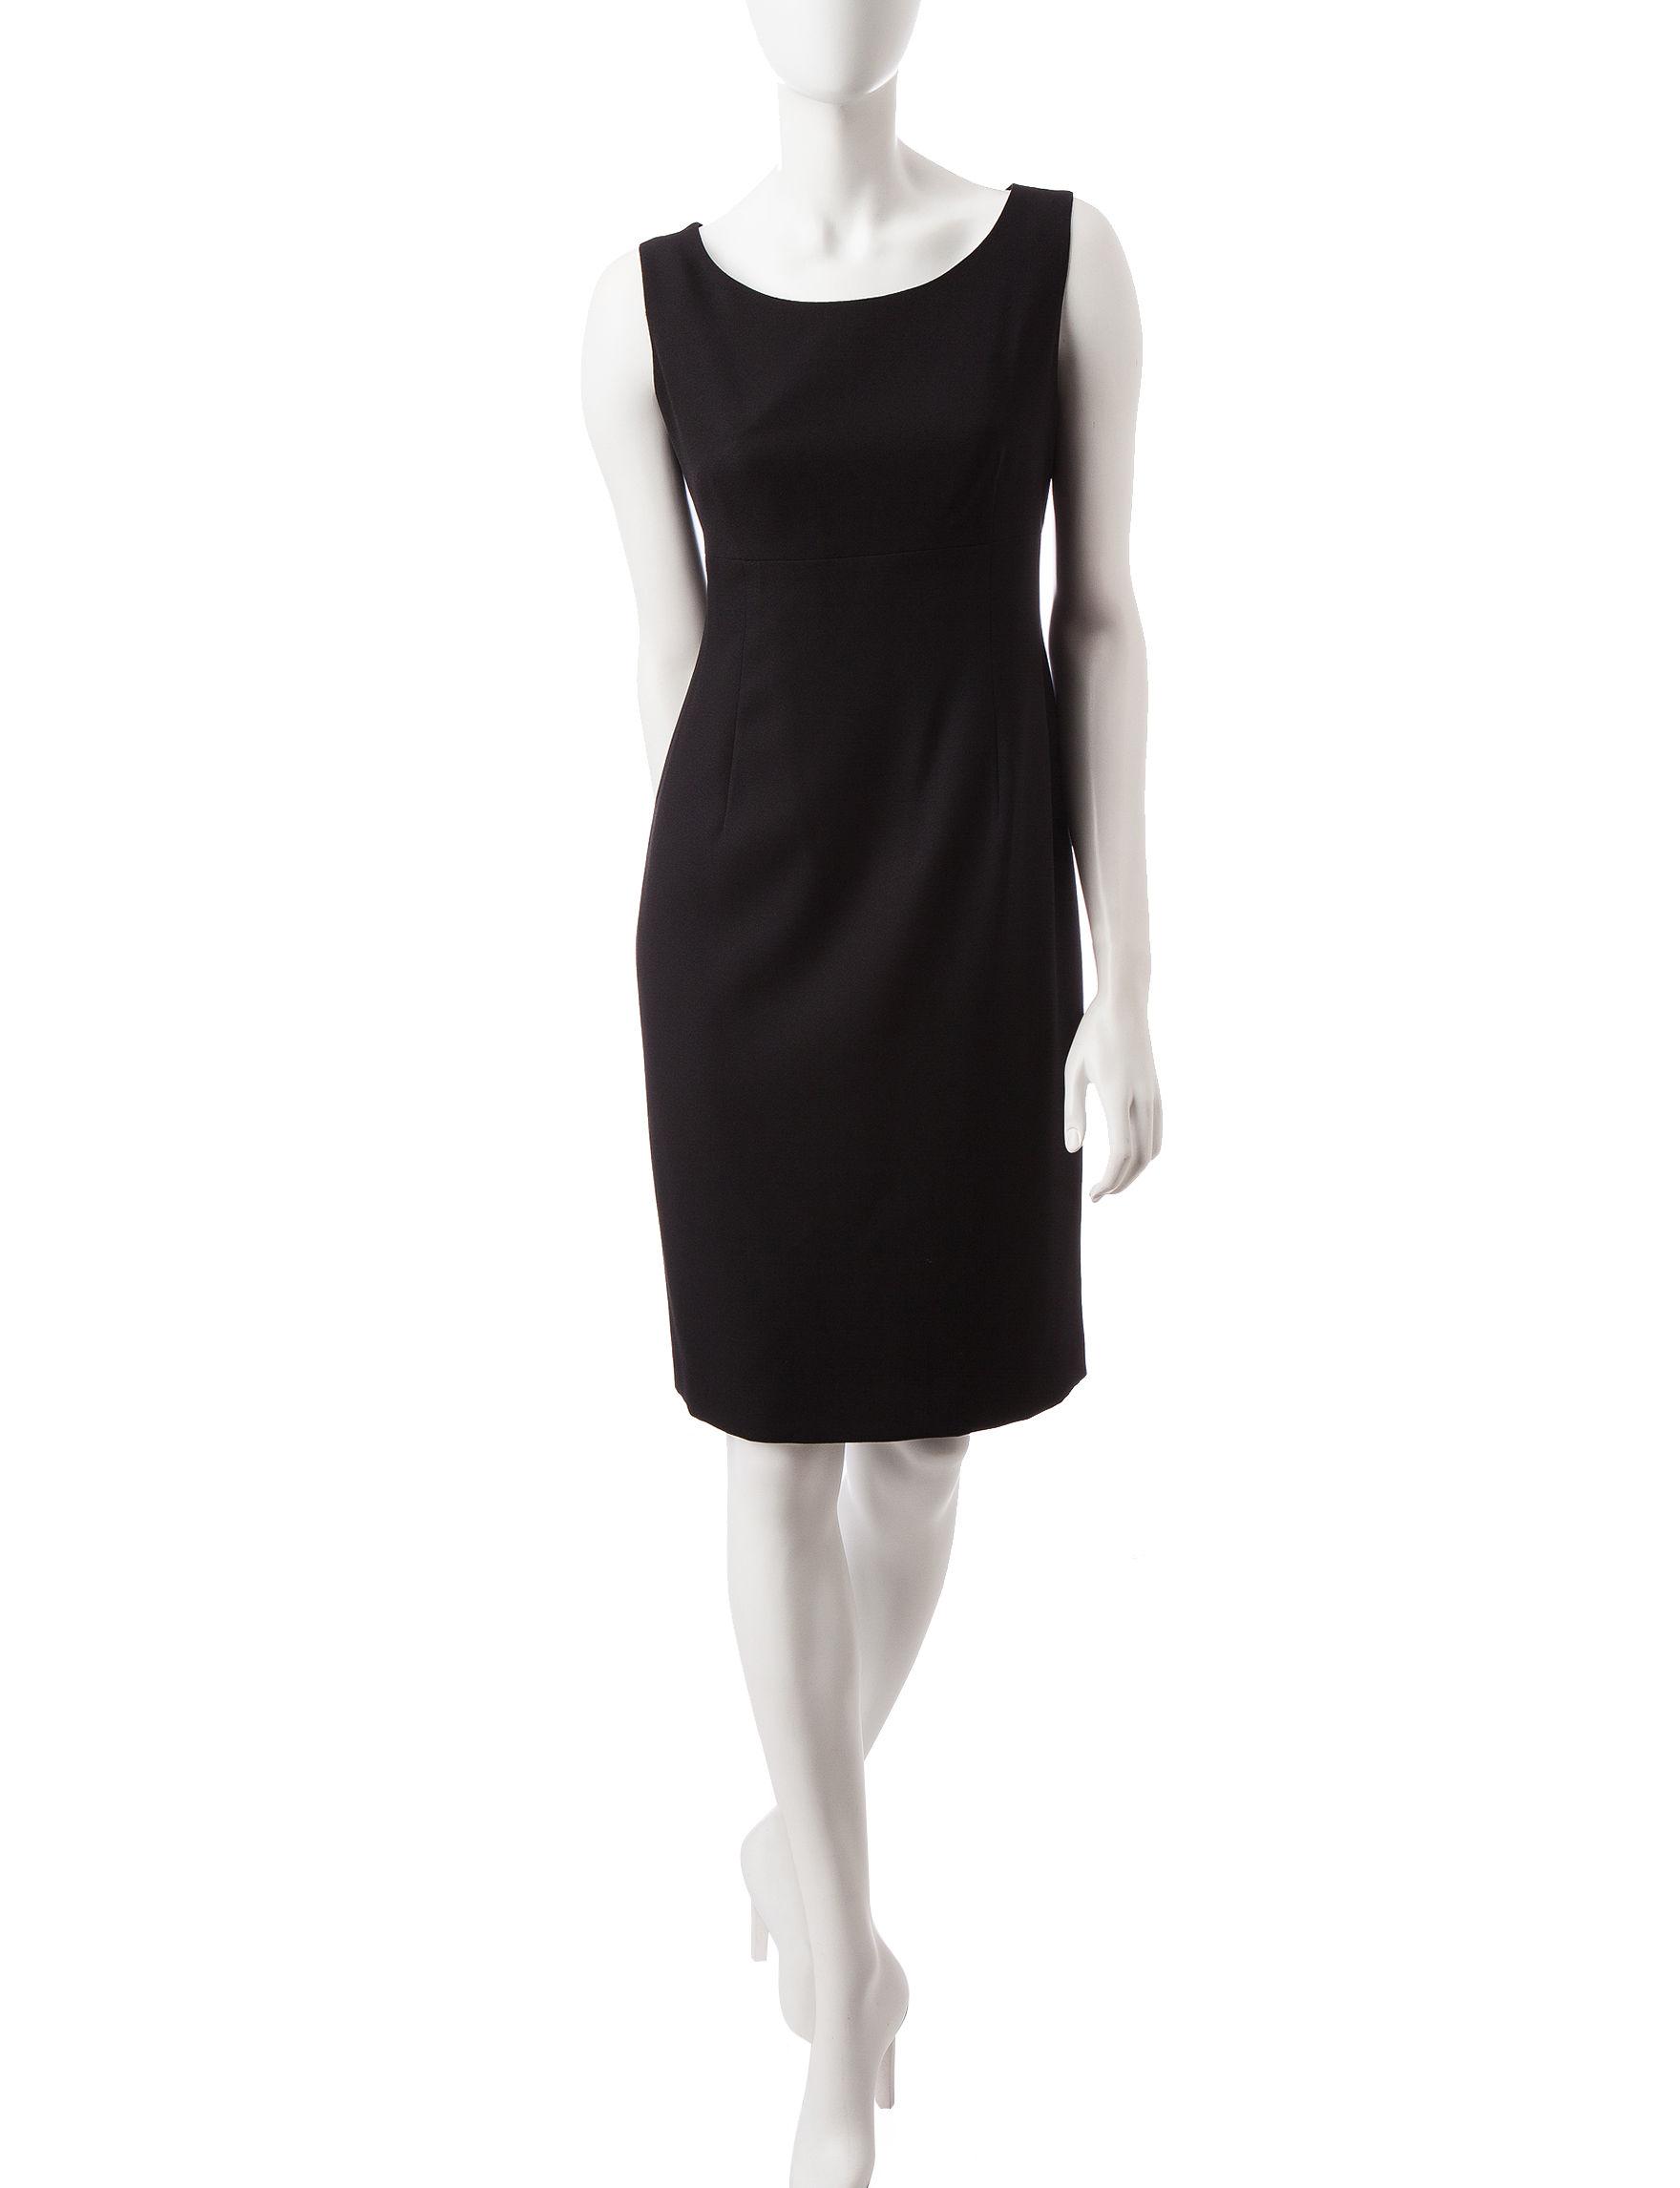 Kasper Black Cocktail & Party Sheath Dresses